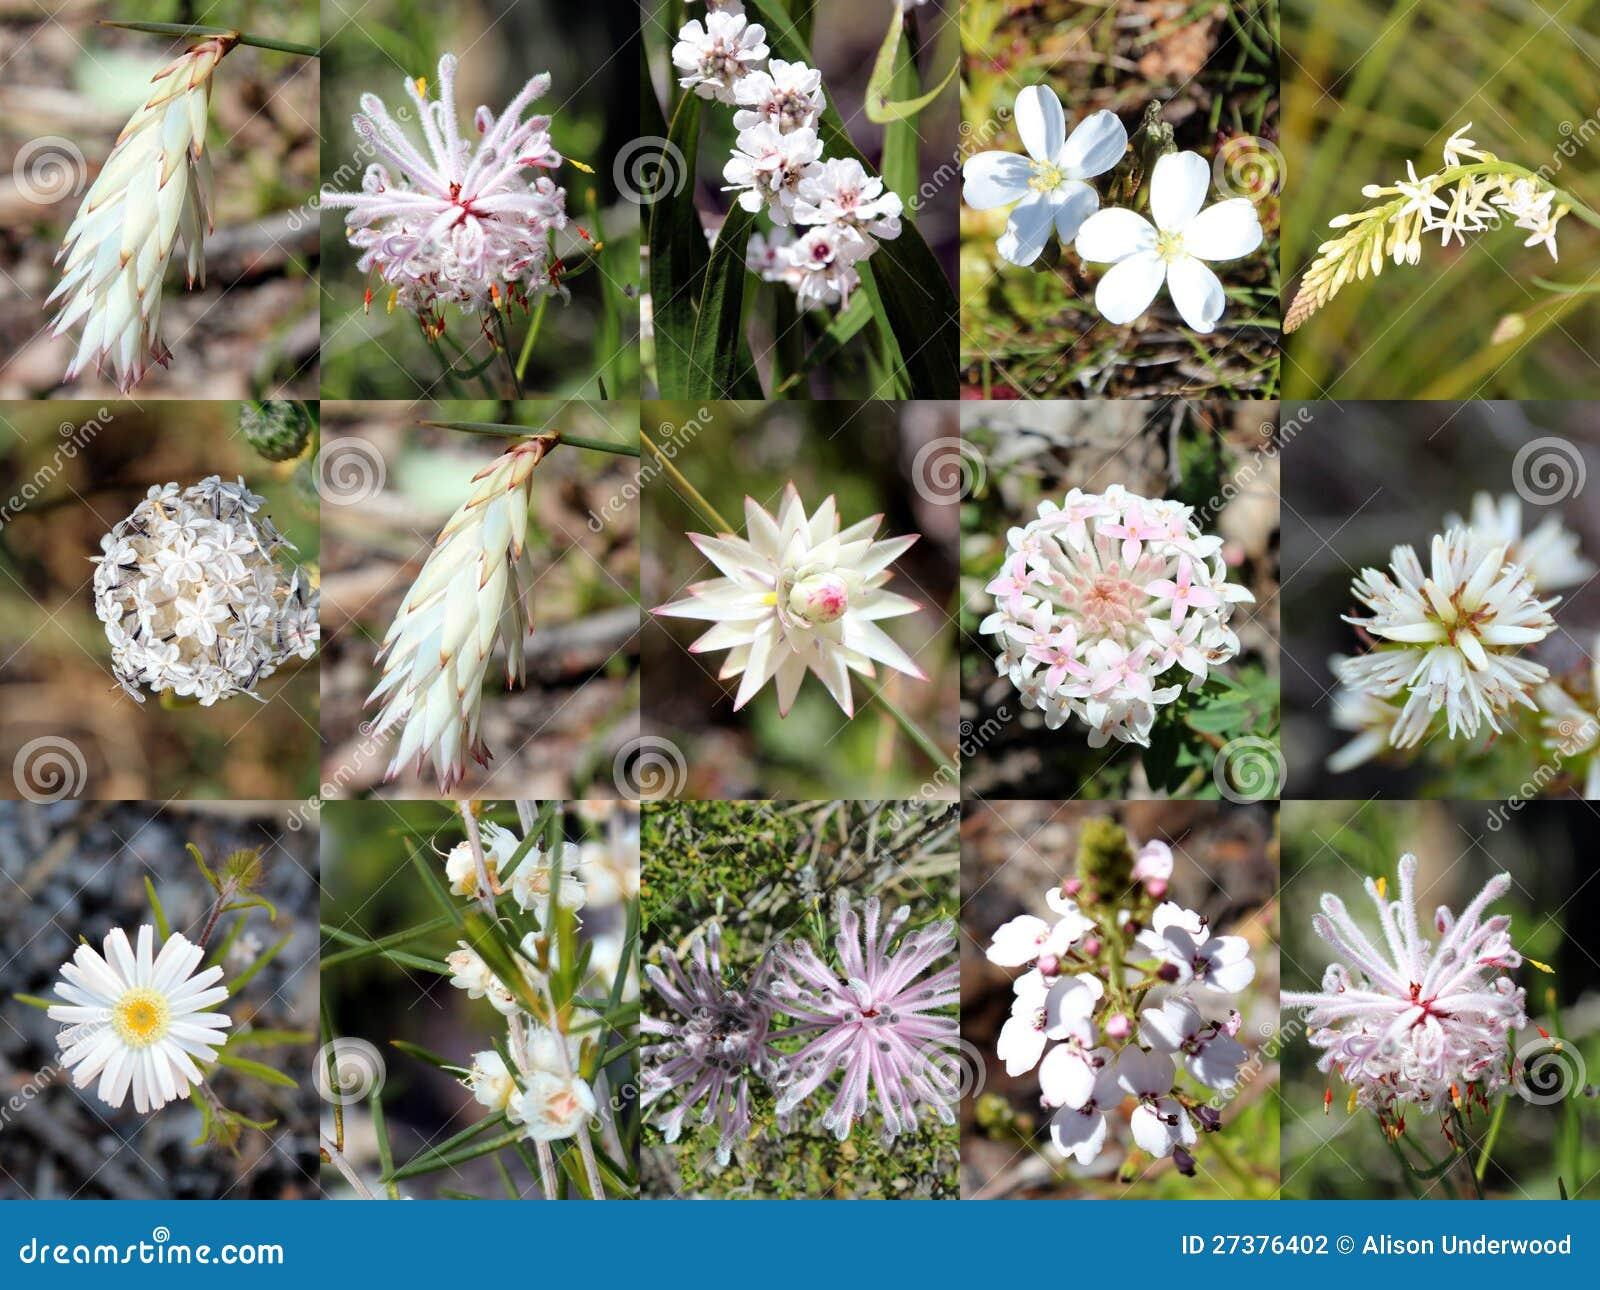 South West Australian White Wild Flowers Collage Stock Photo Image